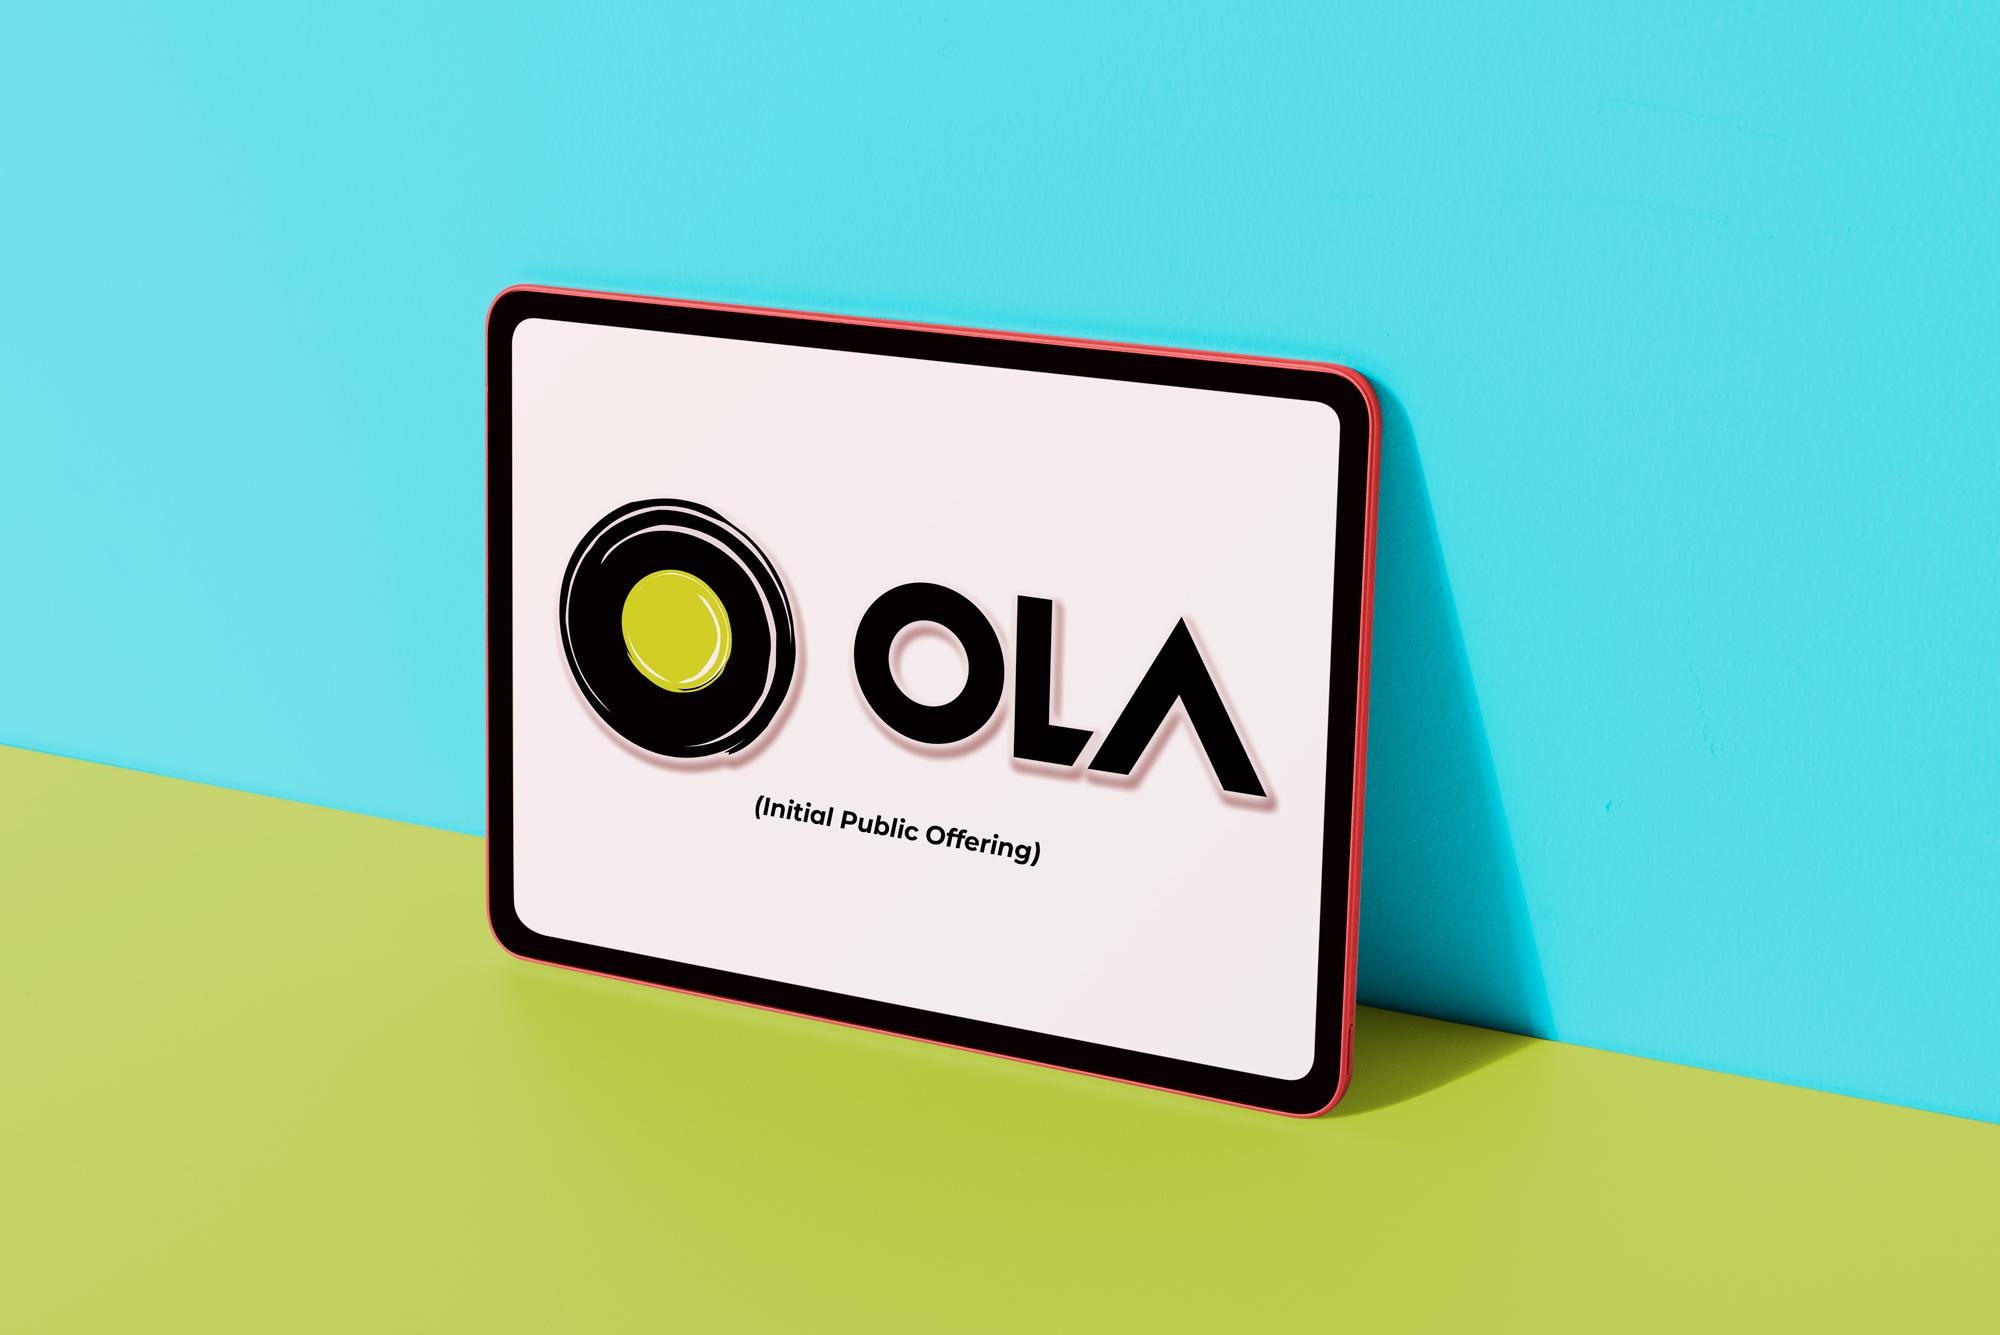 Ola logo Colorful digital tablet